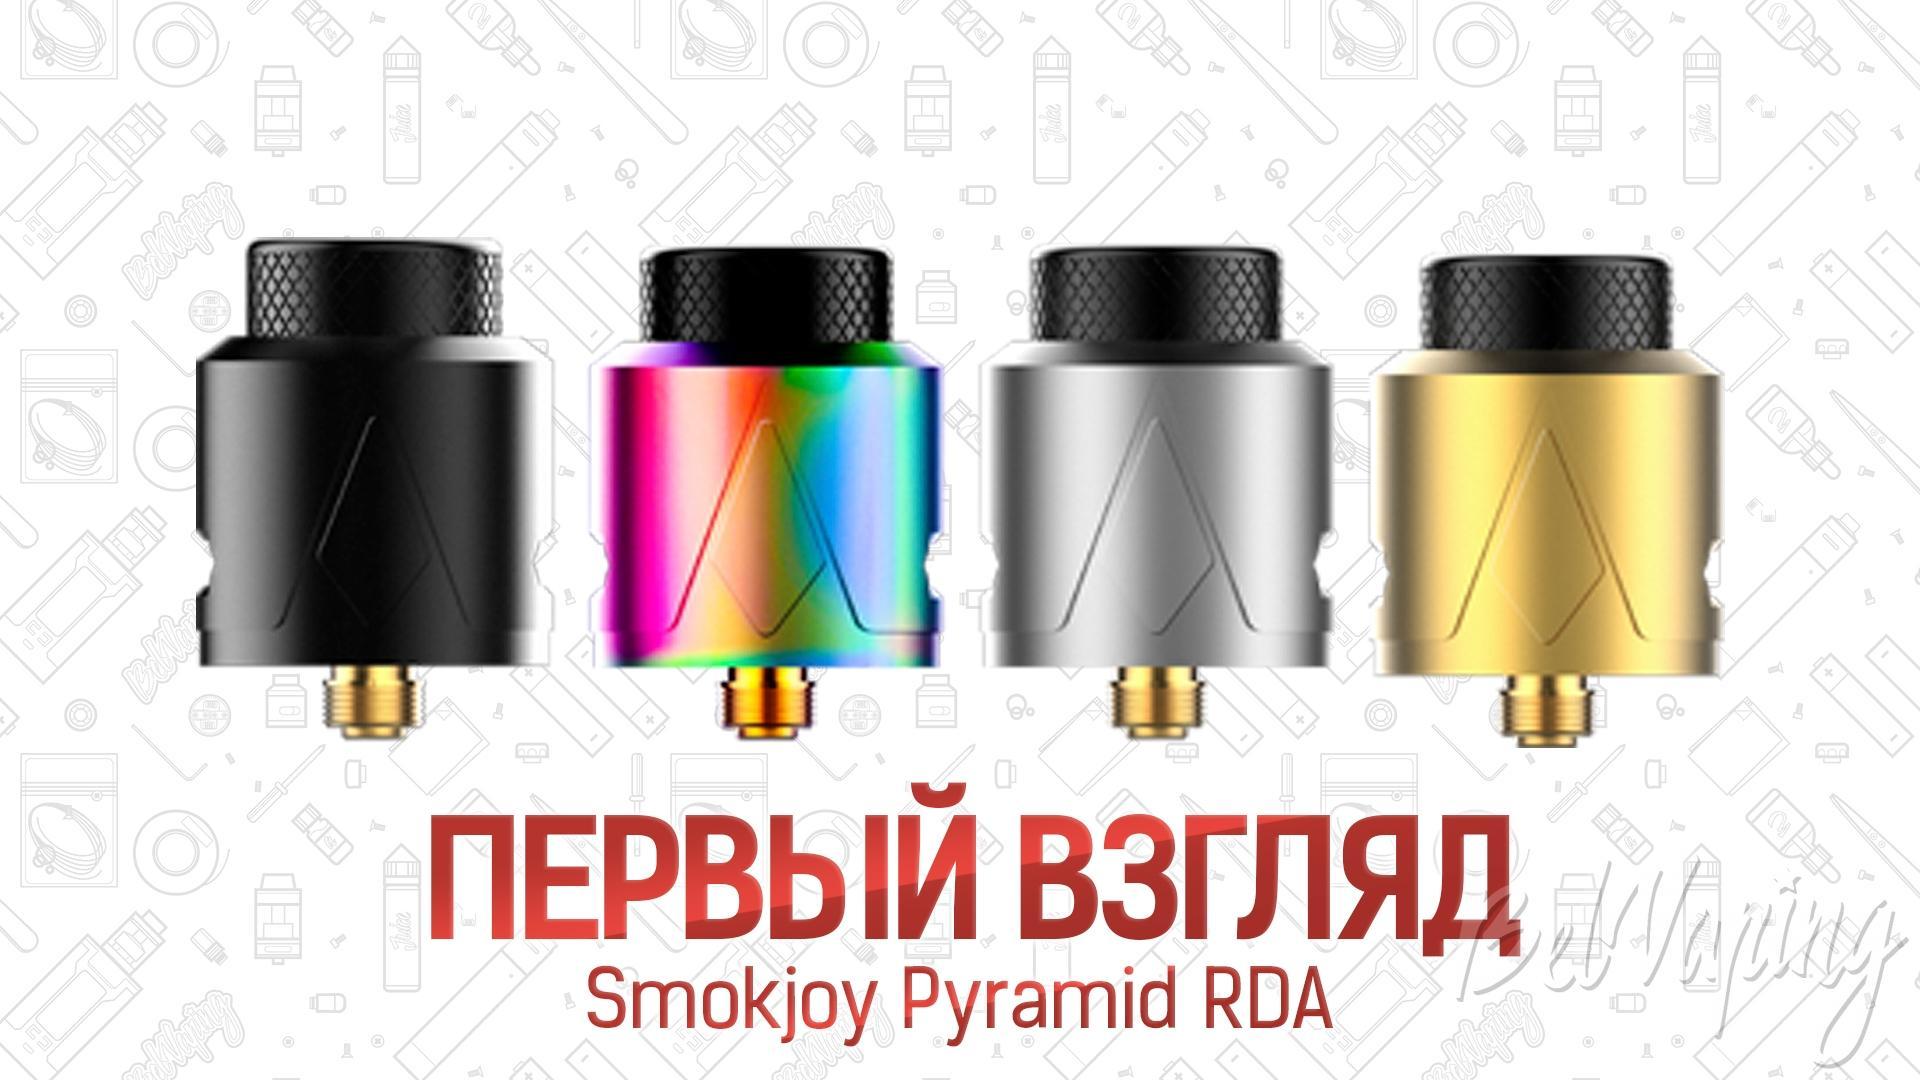 Smokjoy Pyramid RDA. Первый взгляд